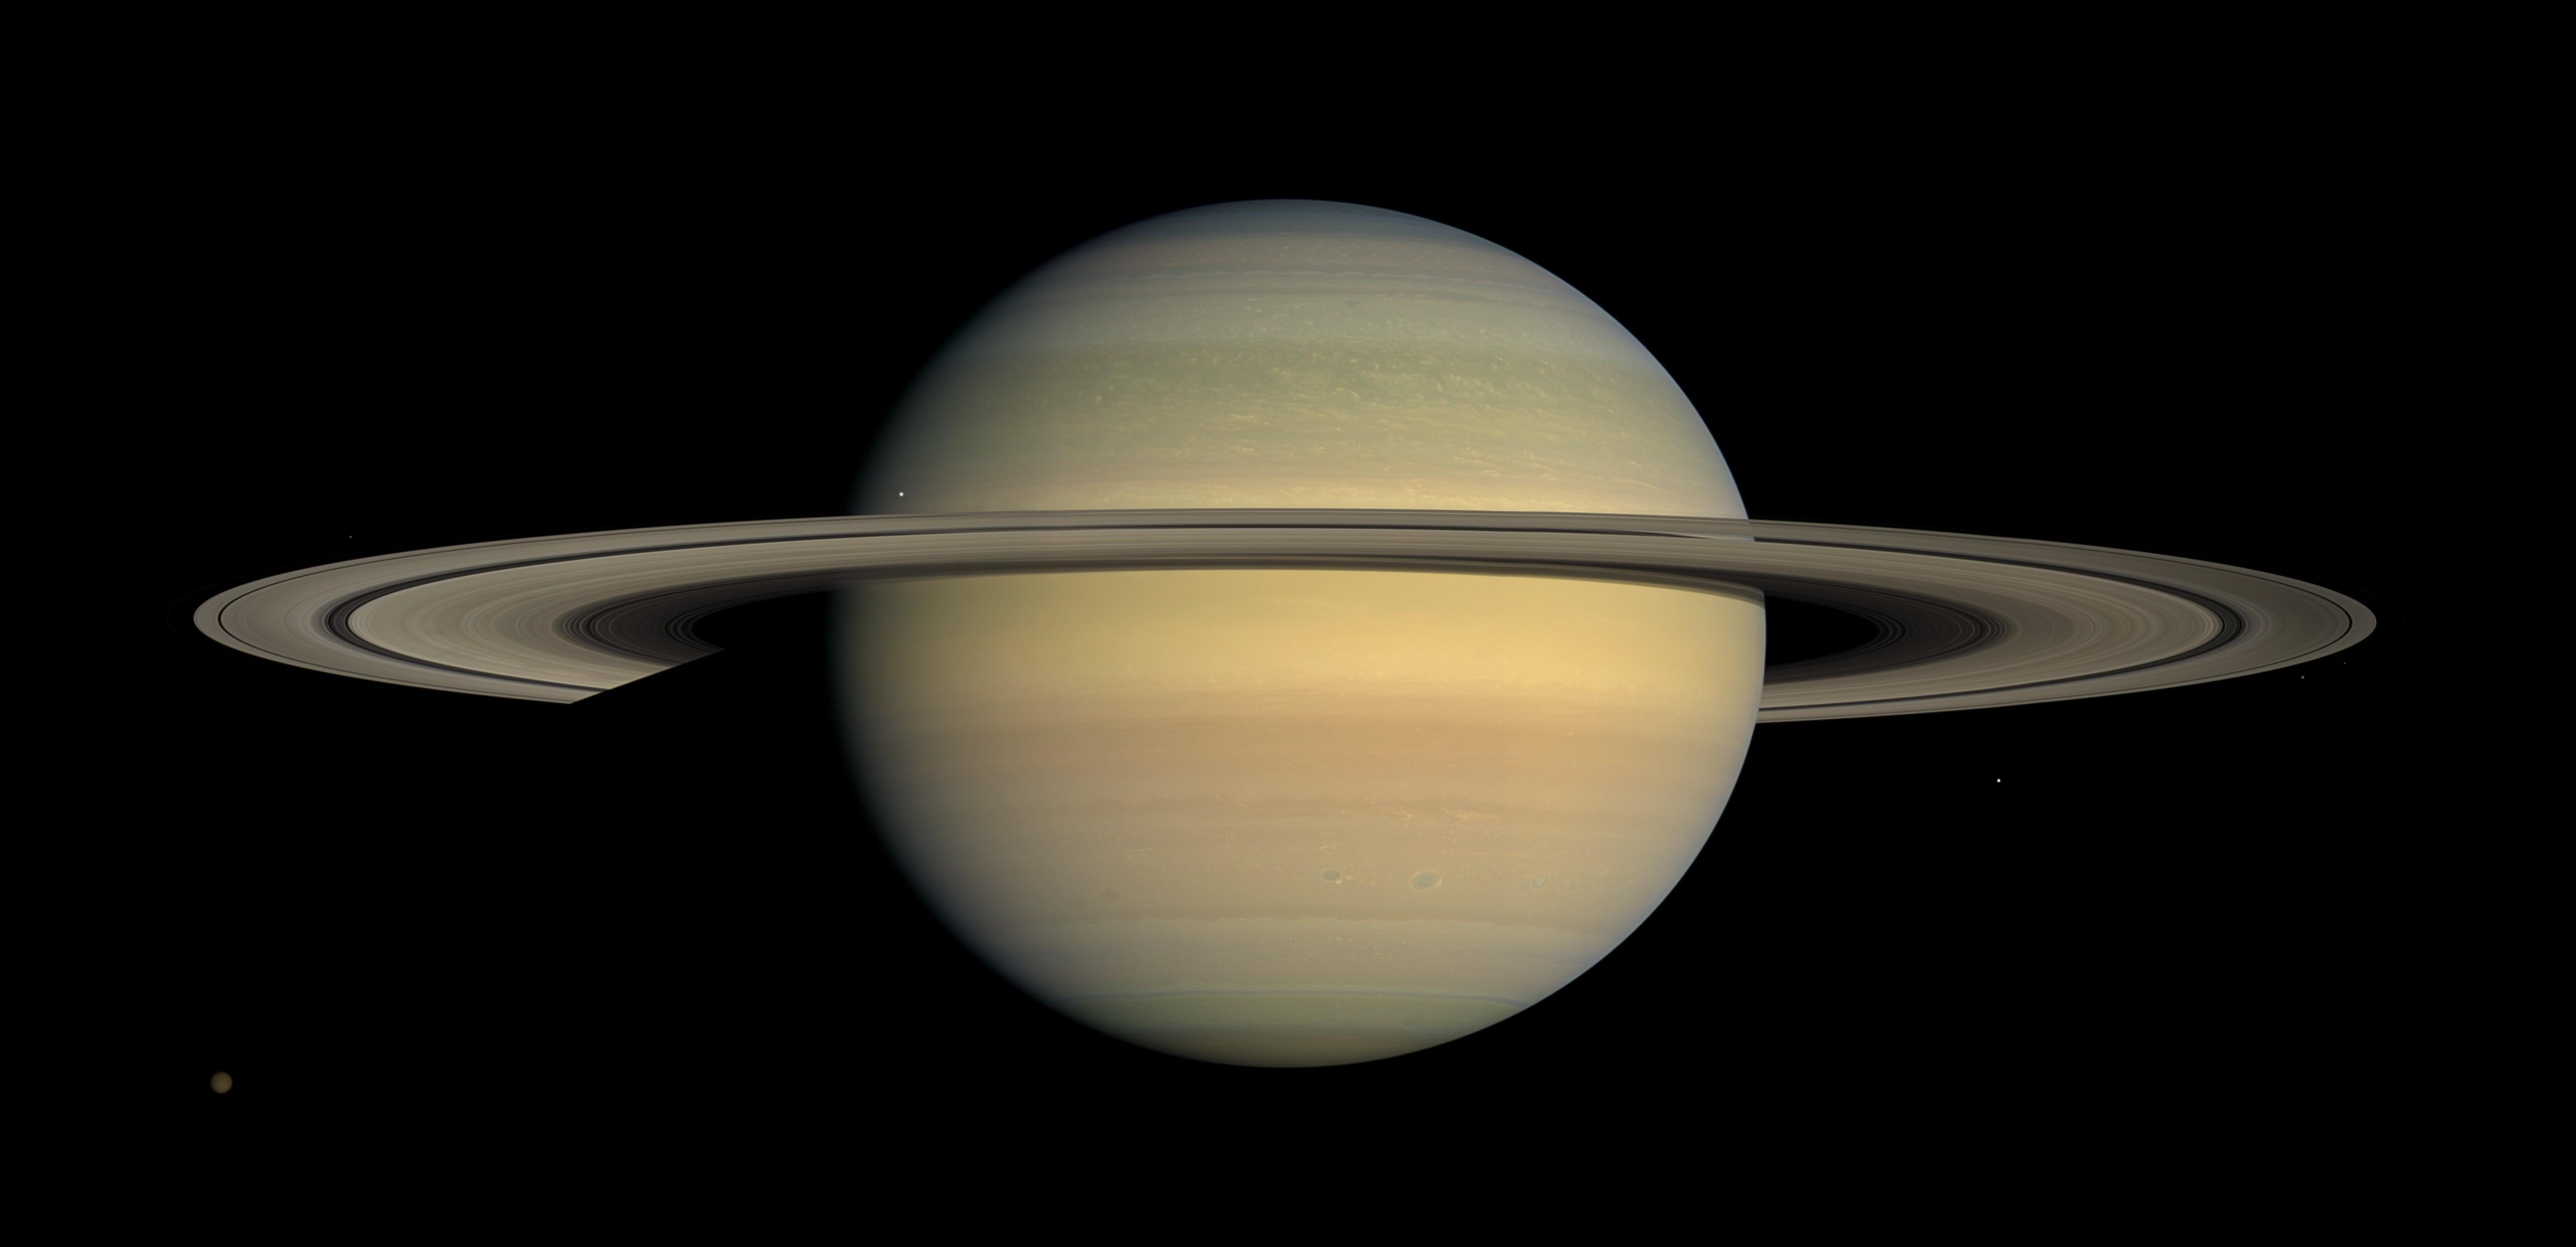 Saturn Pics, Sci Fi Collection